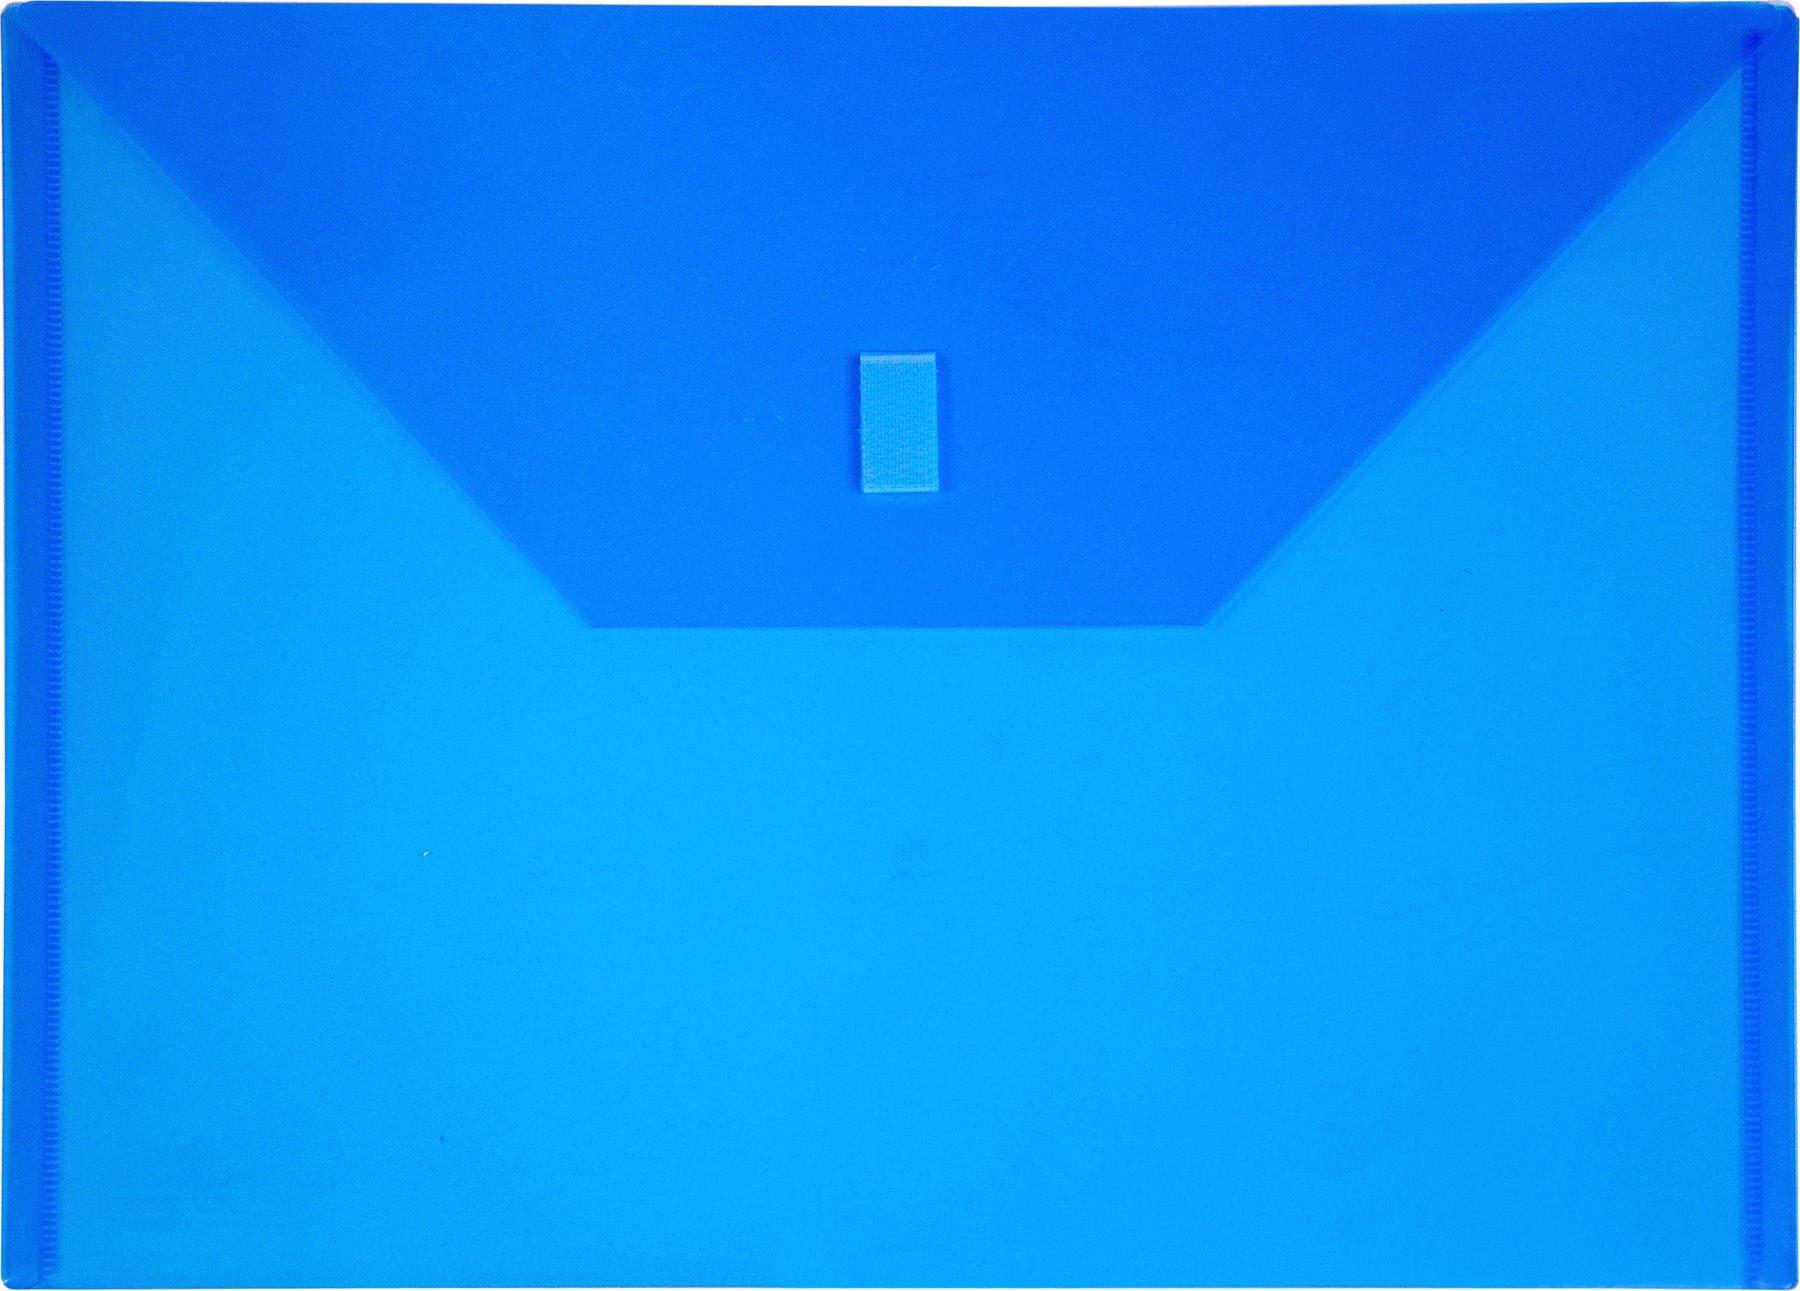 Lion Design-R-Line Poly Envelope,9 3/8 x 13 Inches, Transparent Blue, Pack of 6 (22080-BL-6P)